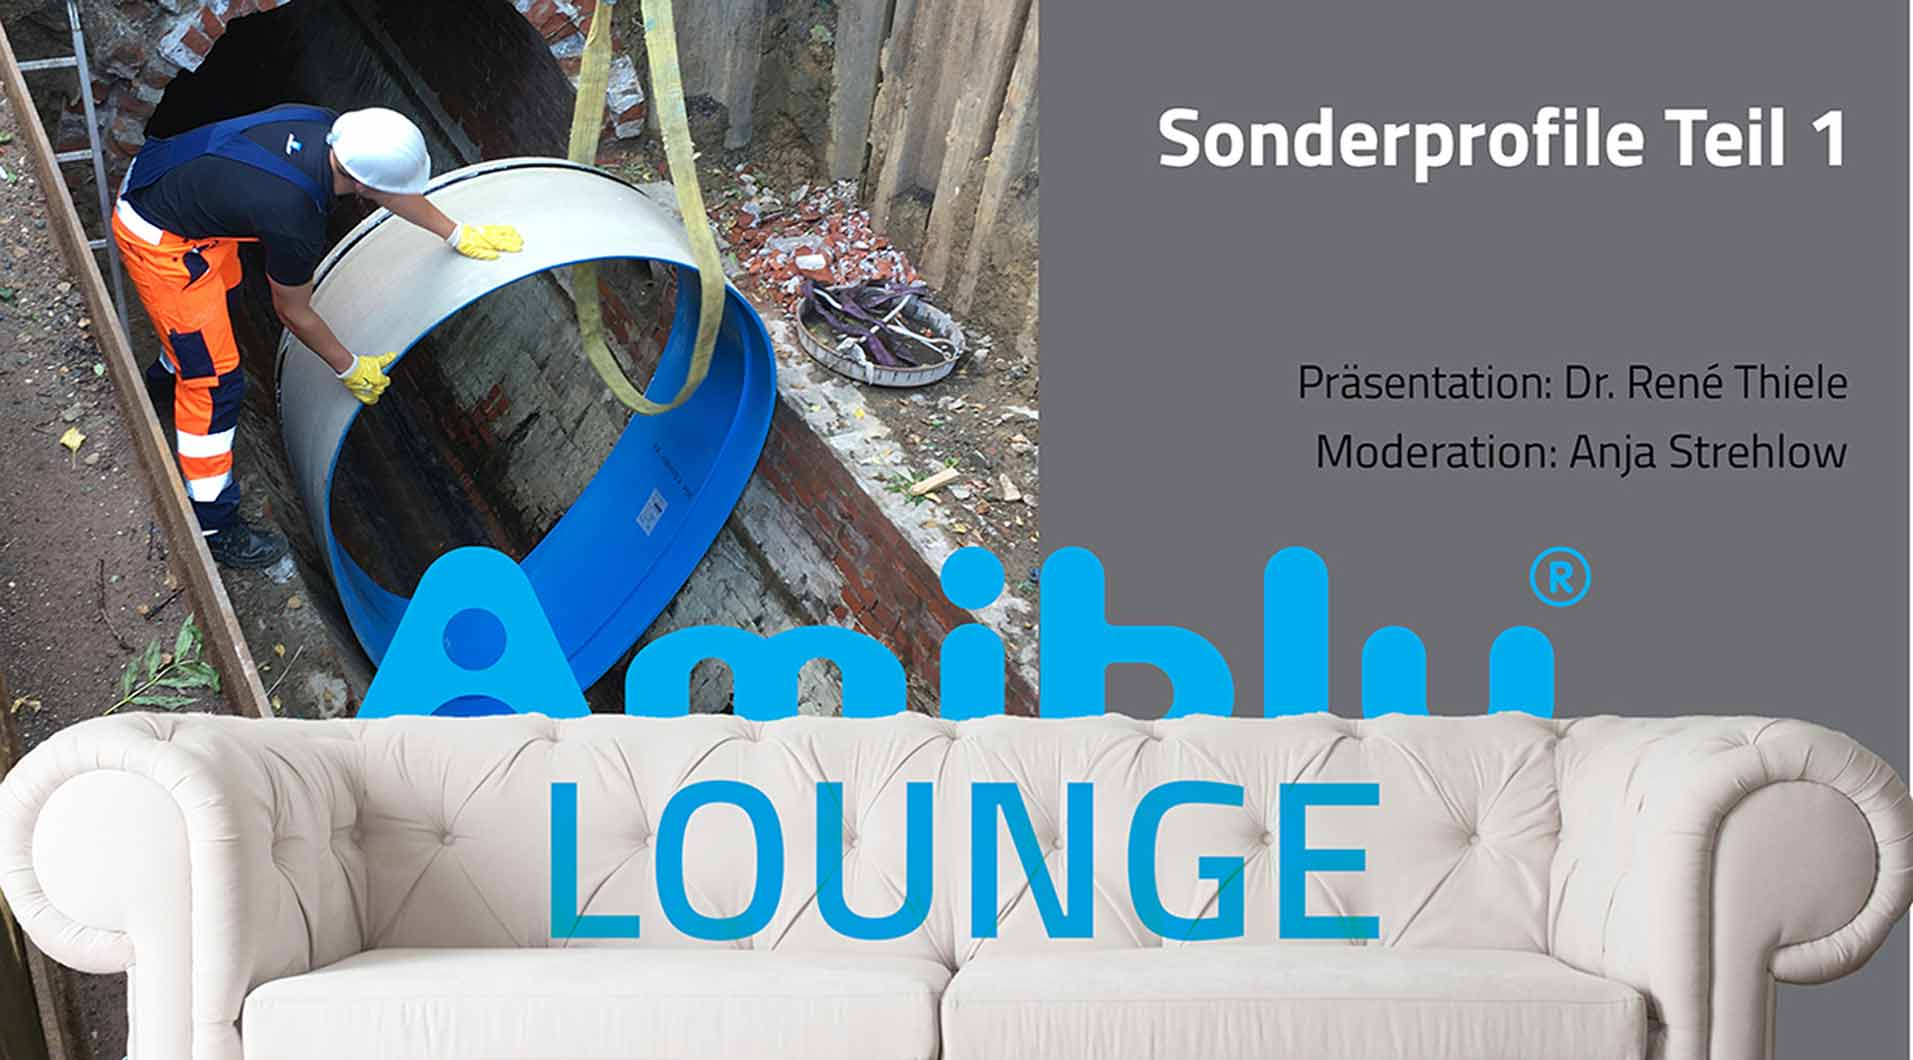 Amiblu Lounge Sonderprofile Teil 1